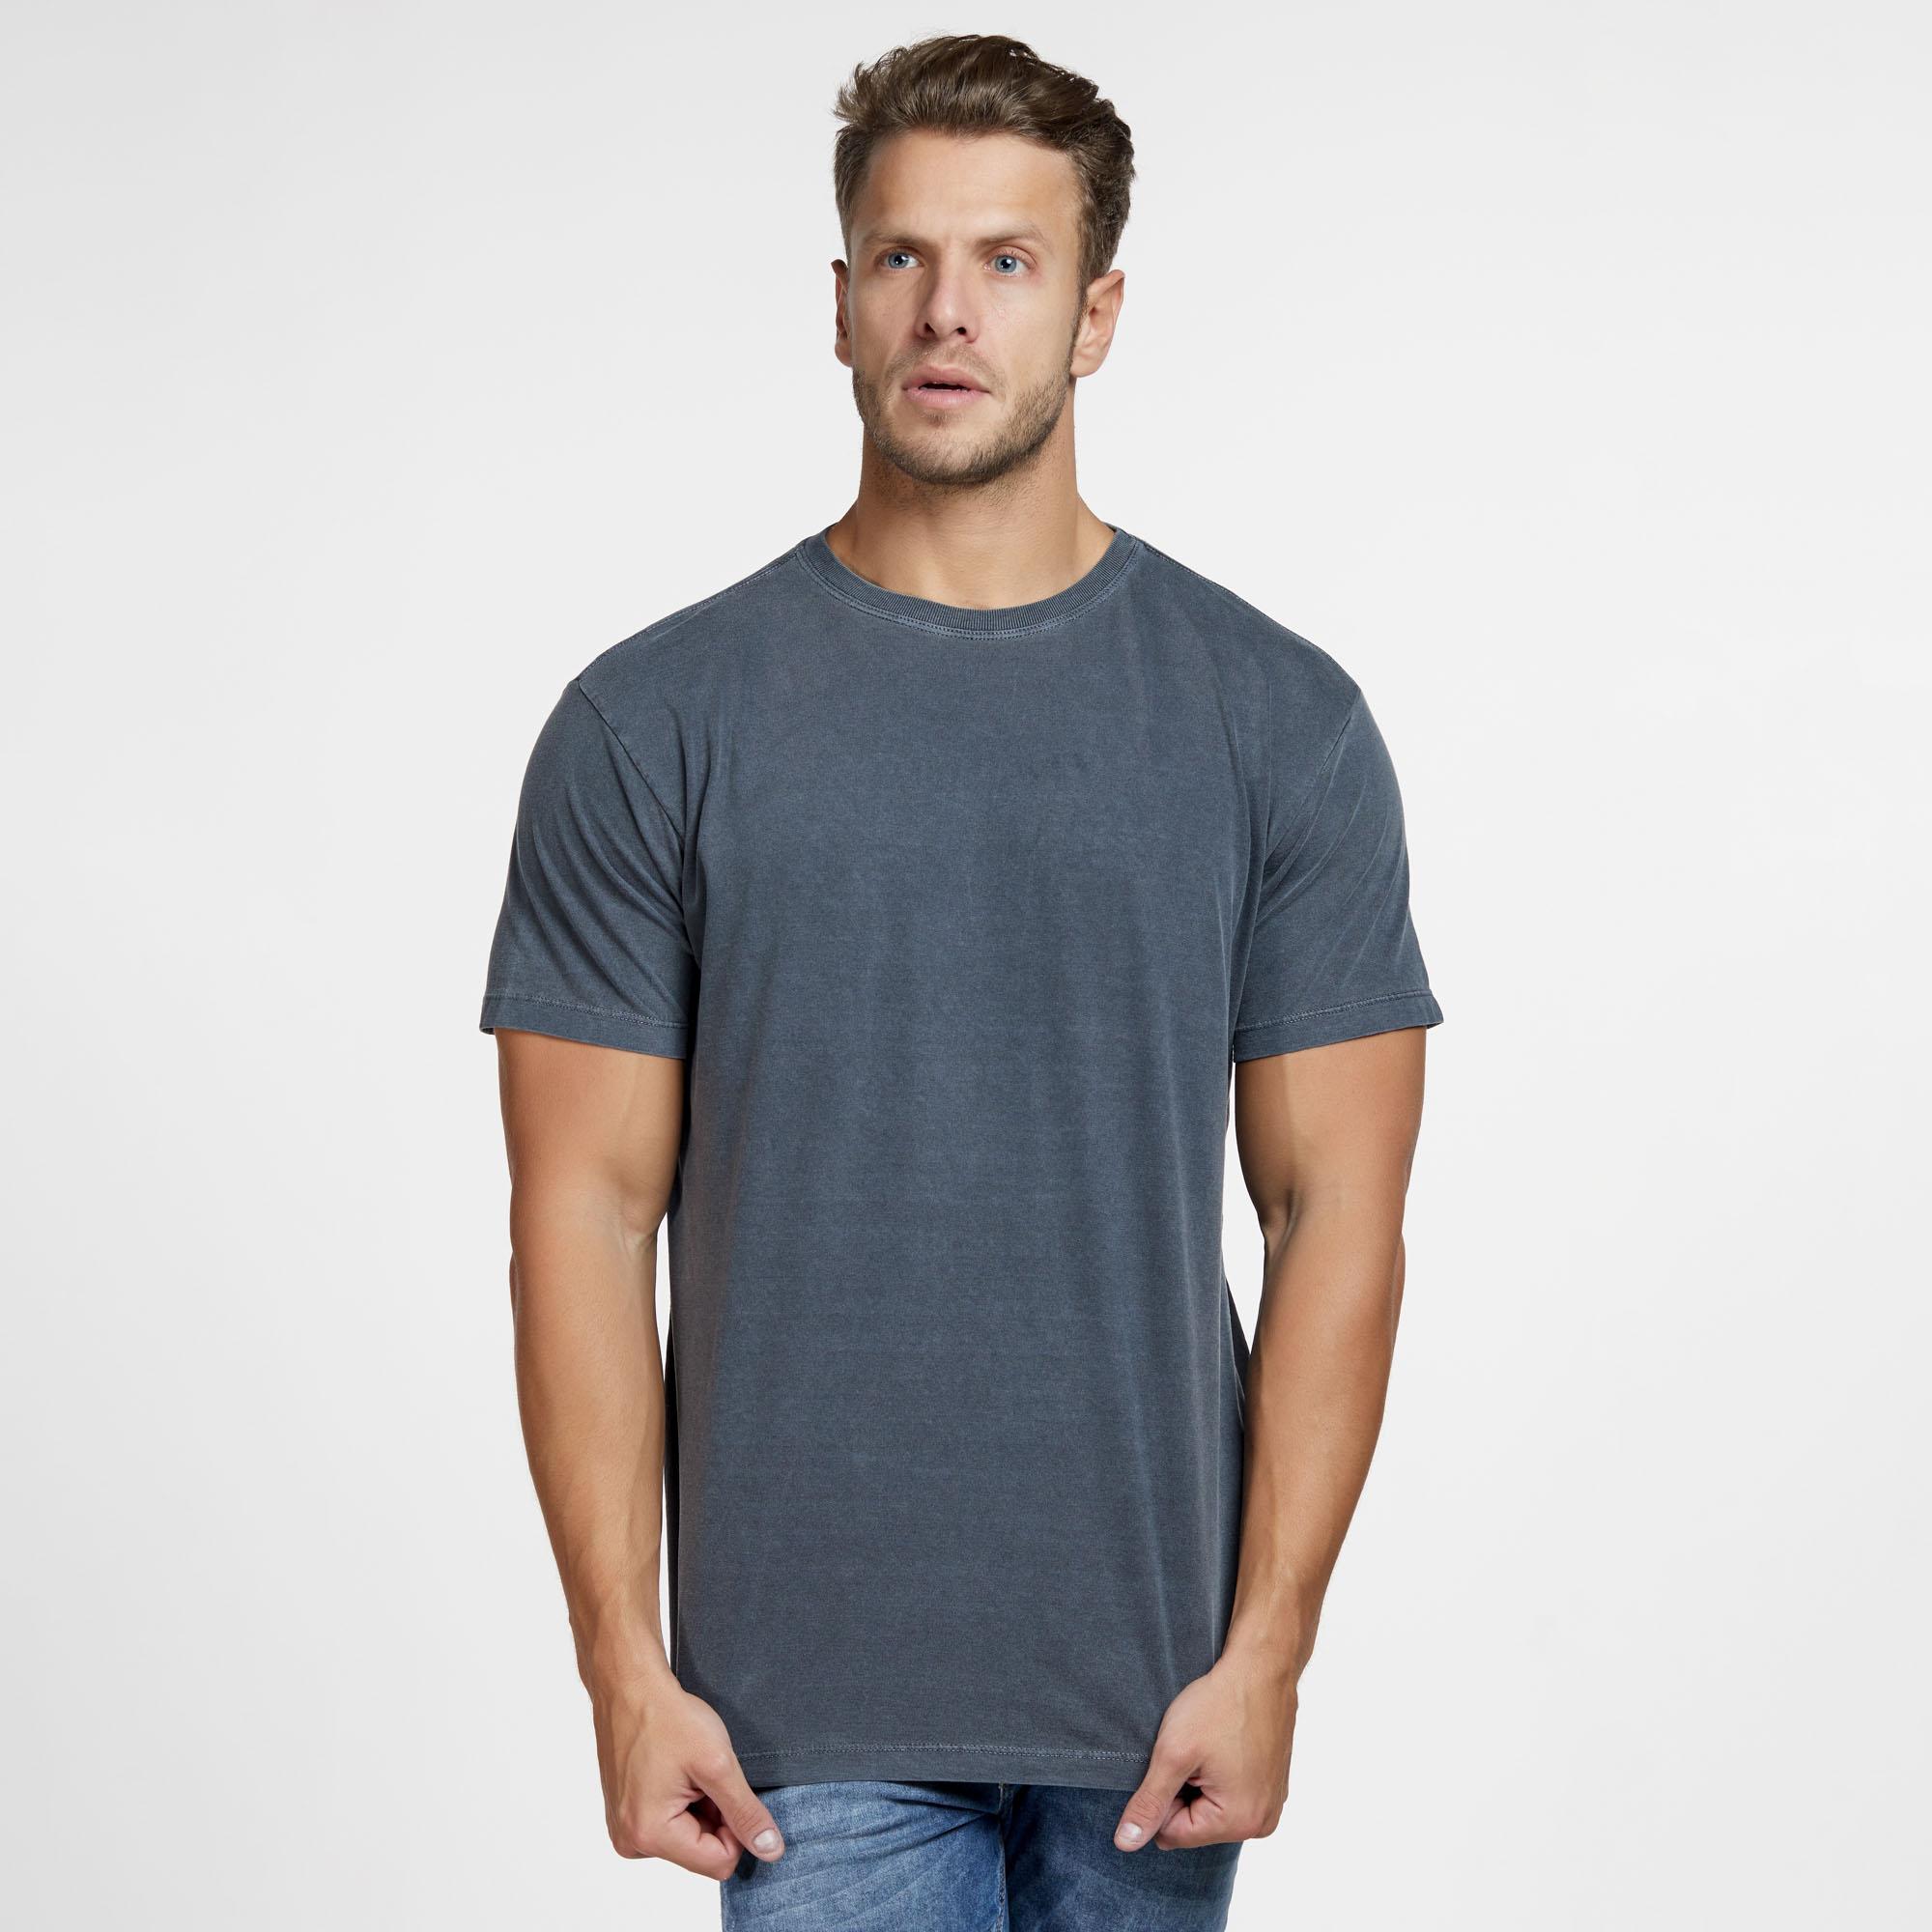 Camiseta Masculina Estonada Cinza Escuro